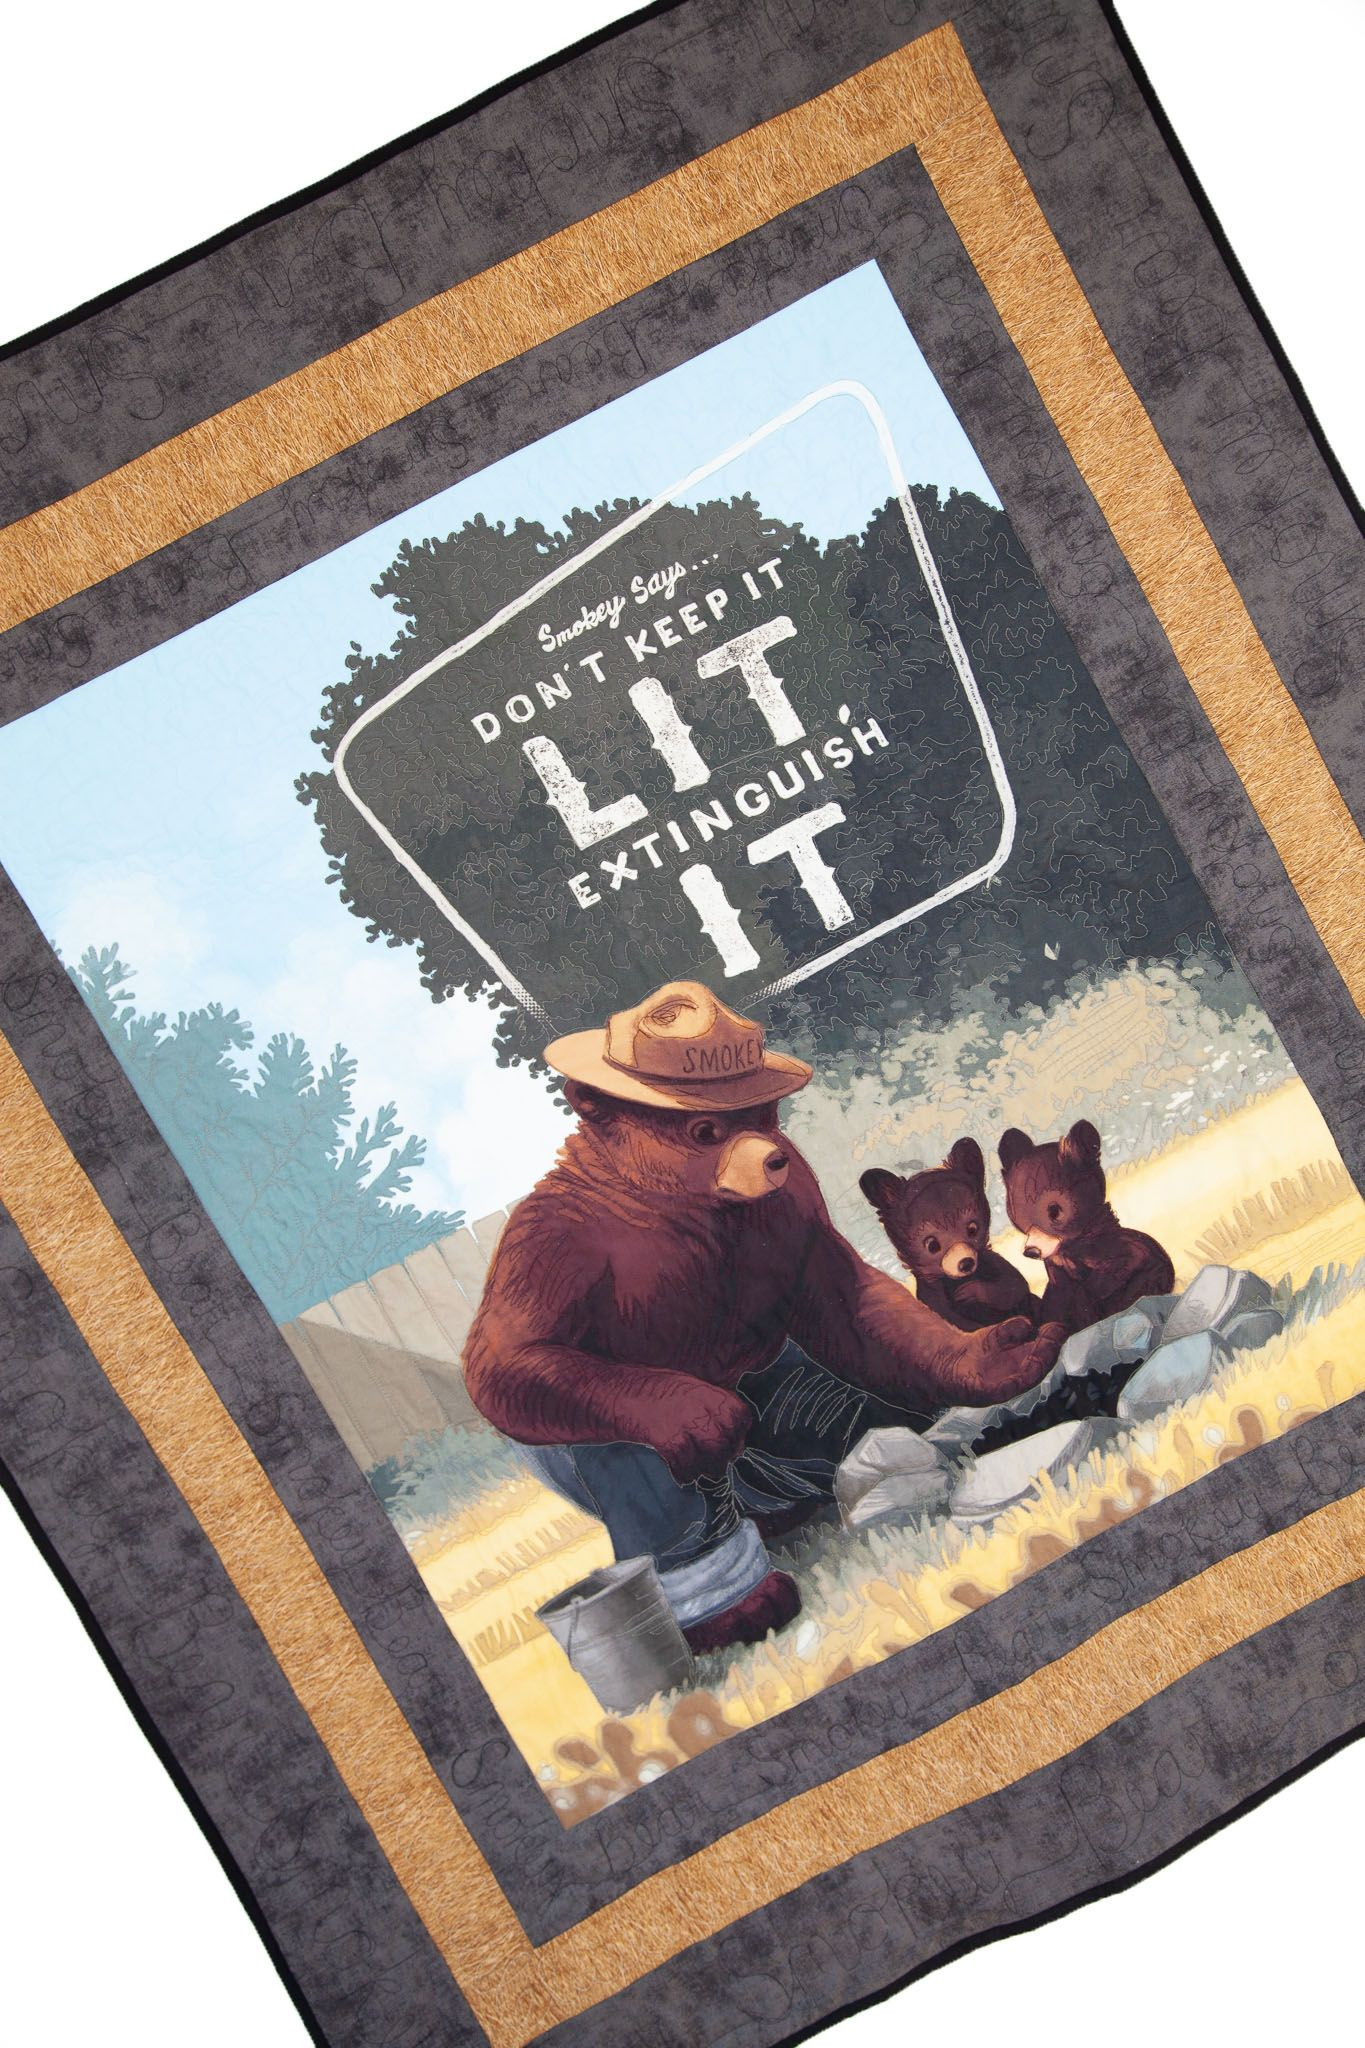 Smokey Bear Panel Quilt Free Pattern Panel Quilts Bear Quilts Panel Quilt Patterns